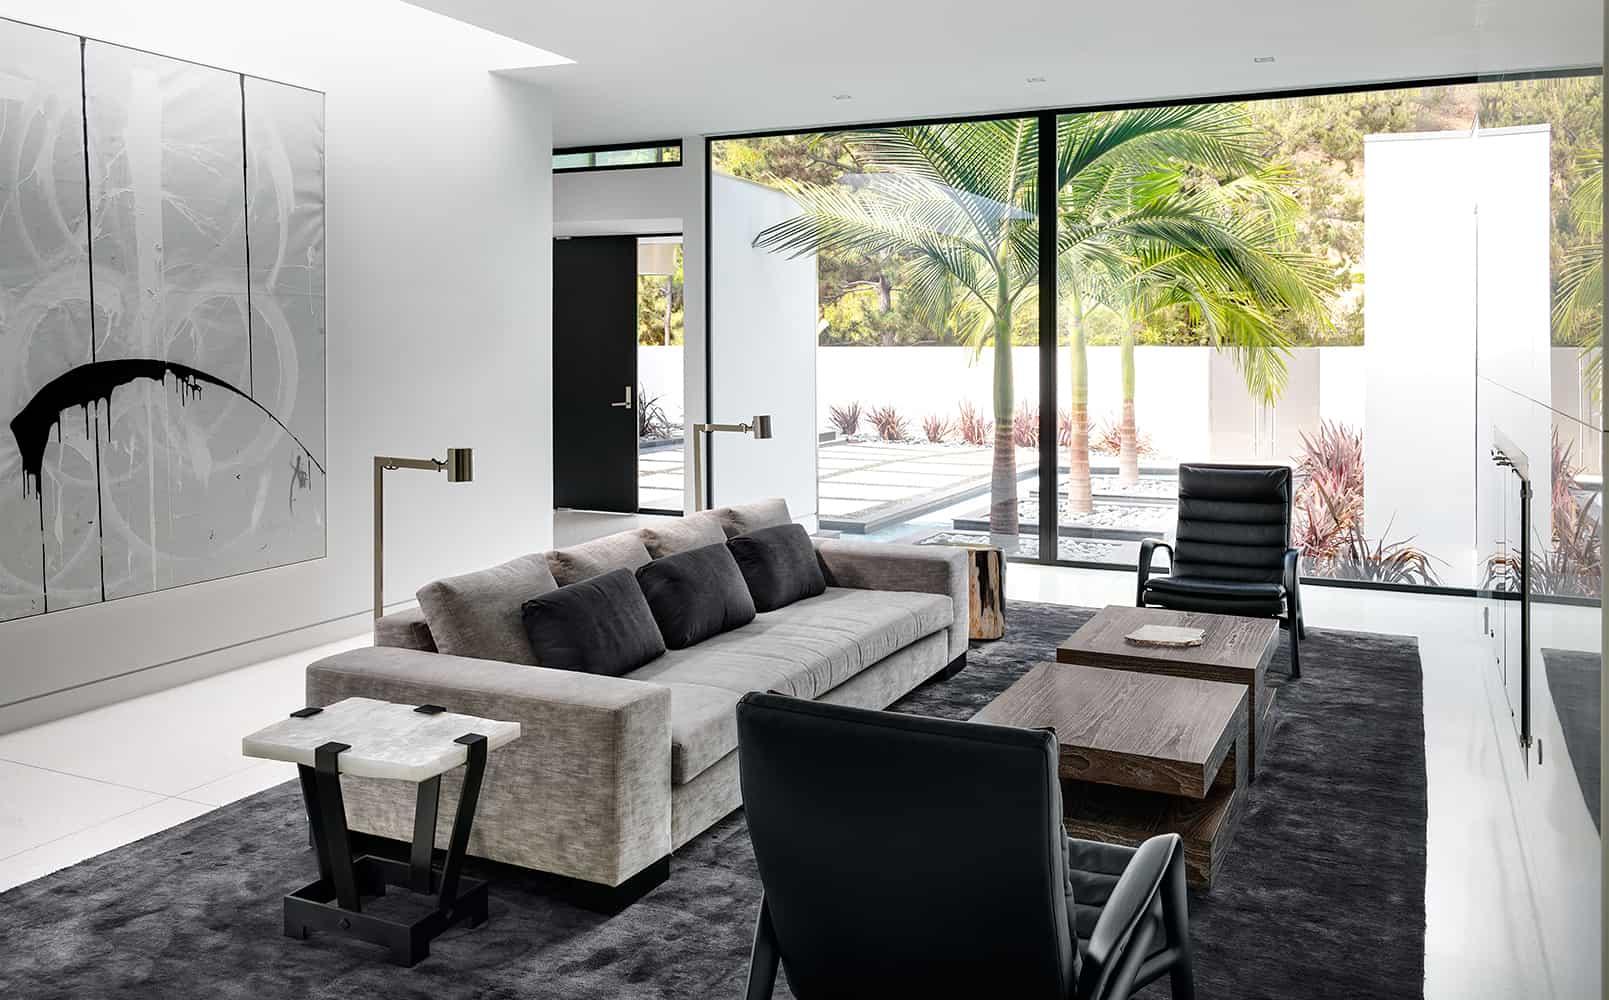 Modern-Home-Renovation-Belzberg Architects-10-1 Kindesign